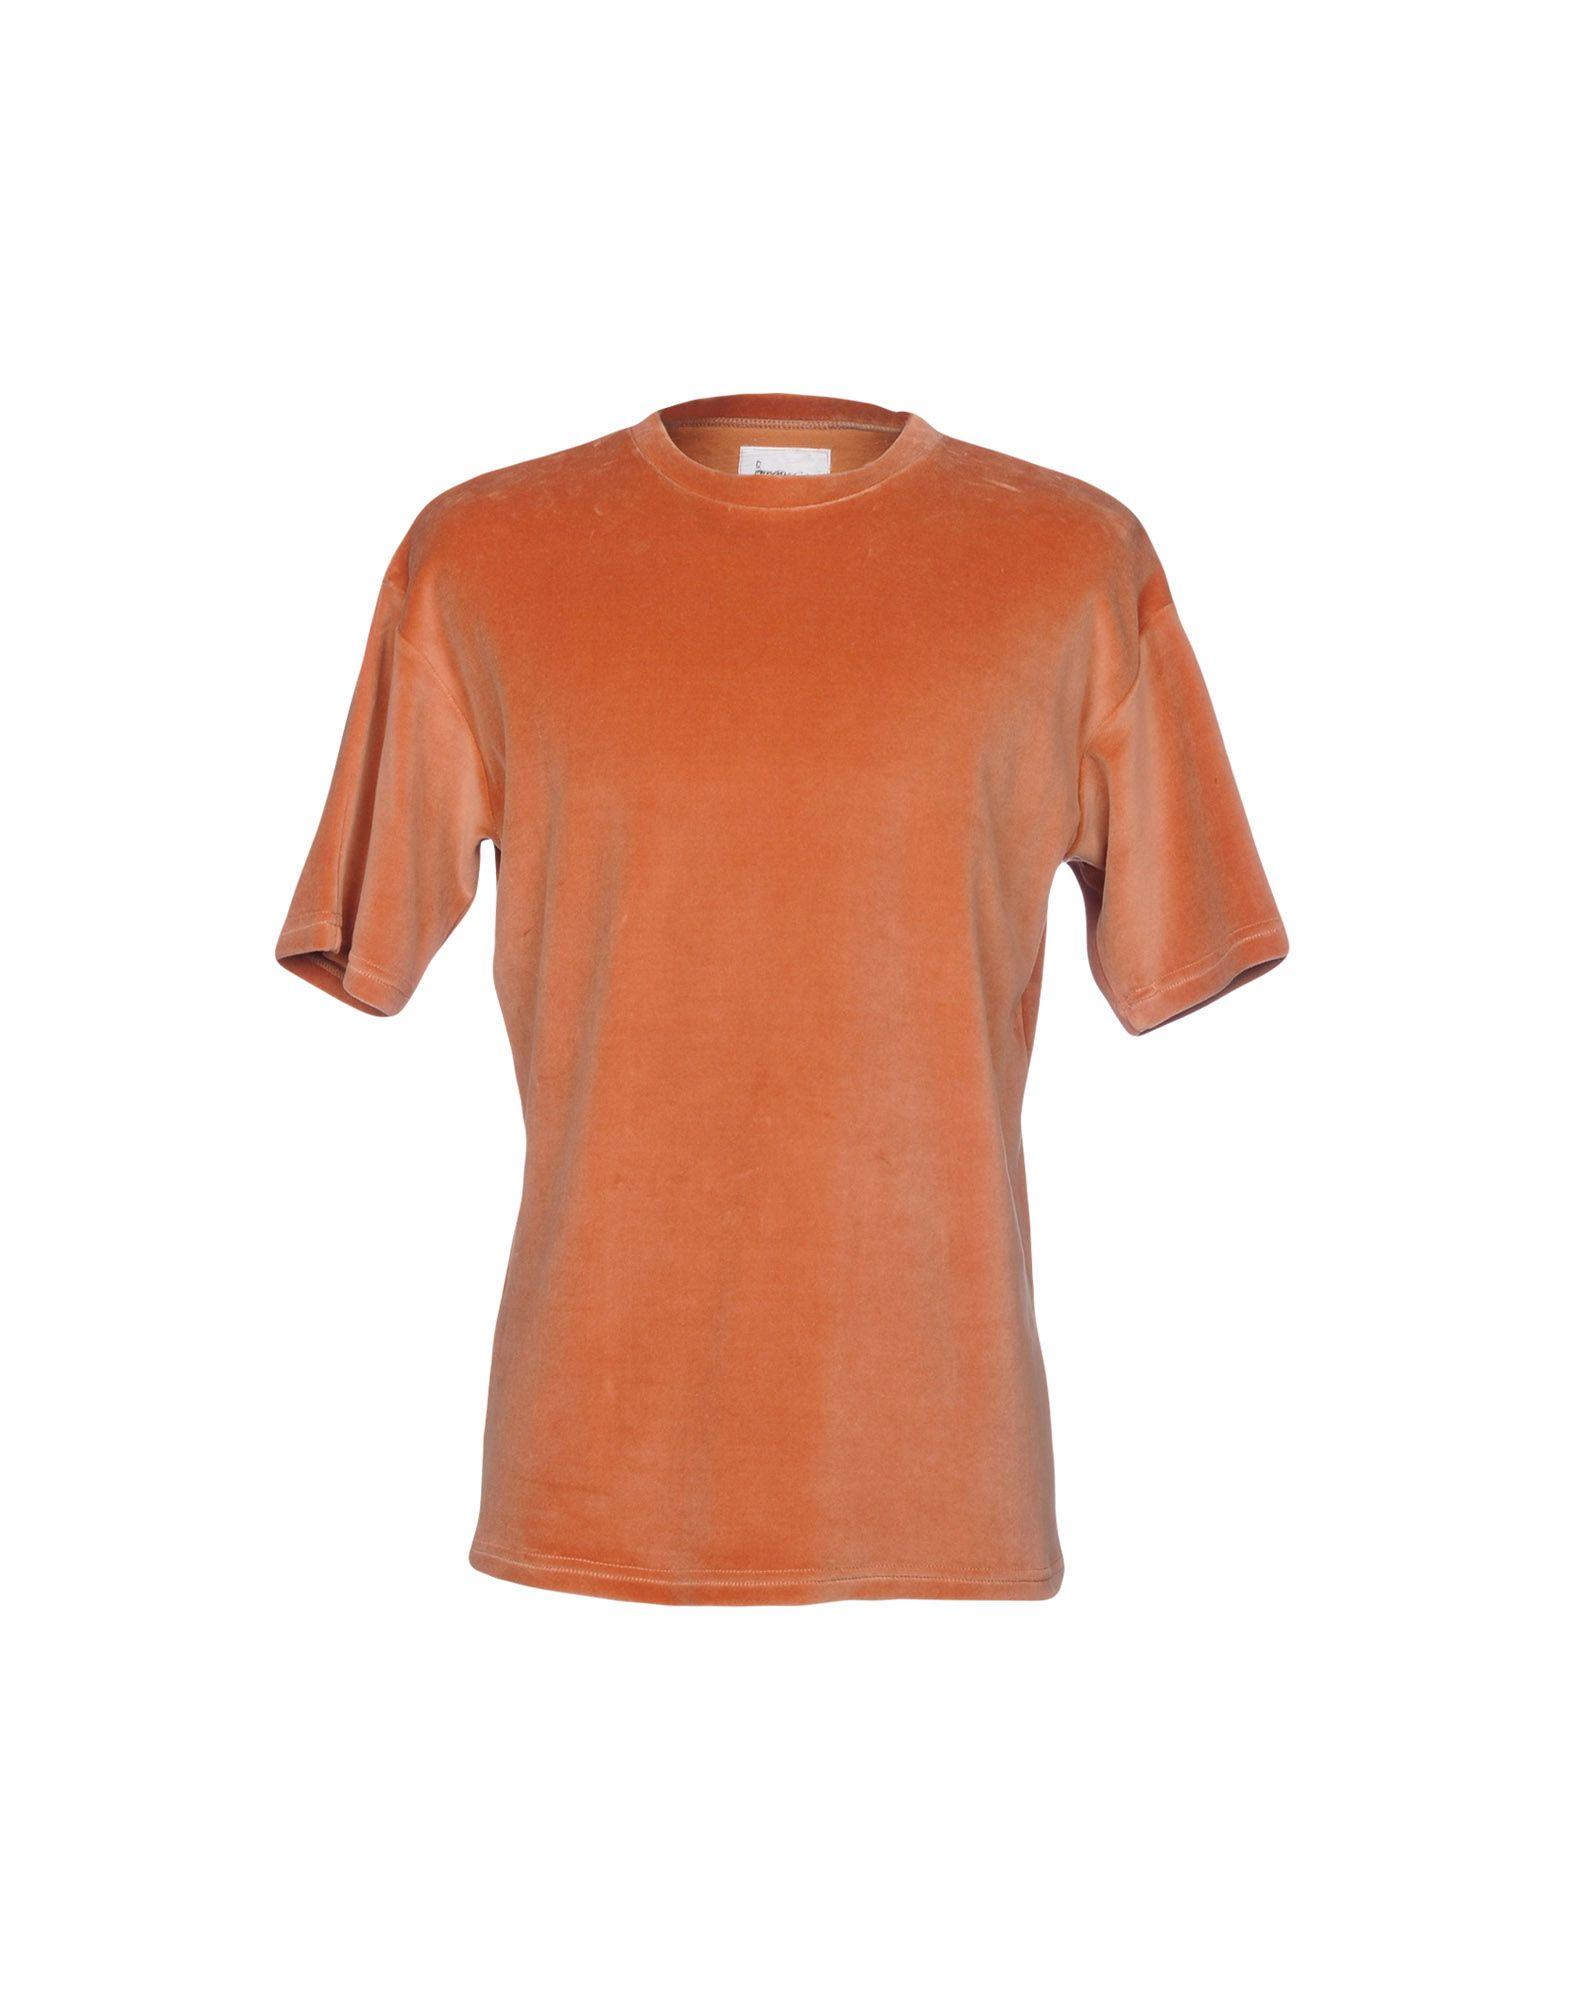 A buon mercato - A buon mercato T-Shirt Bonsai Uomo - mercato 12186614NG 57a79a